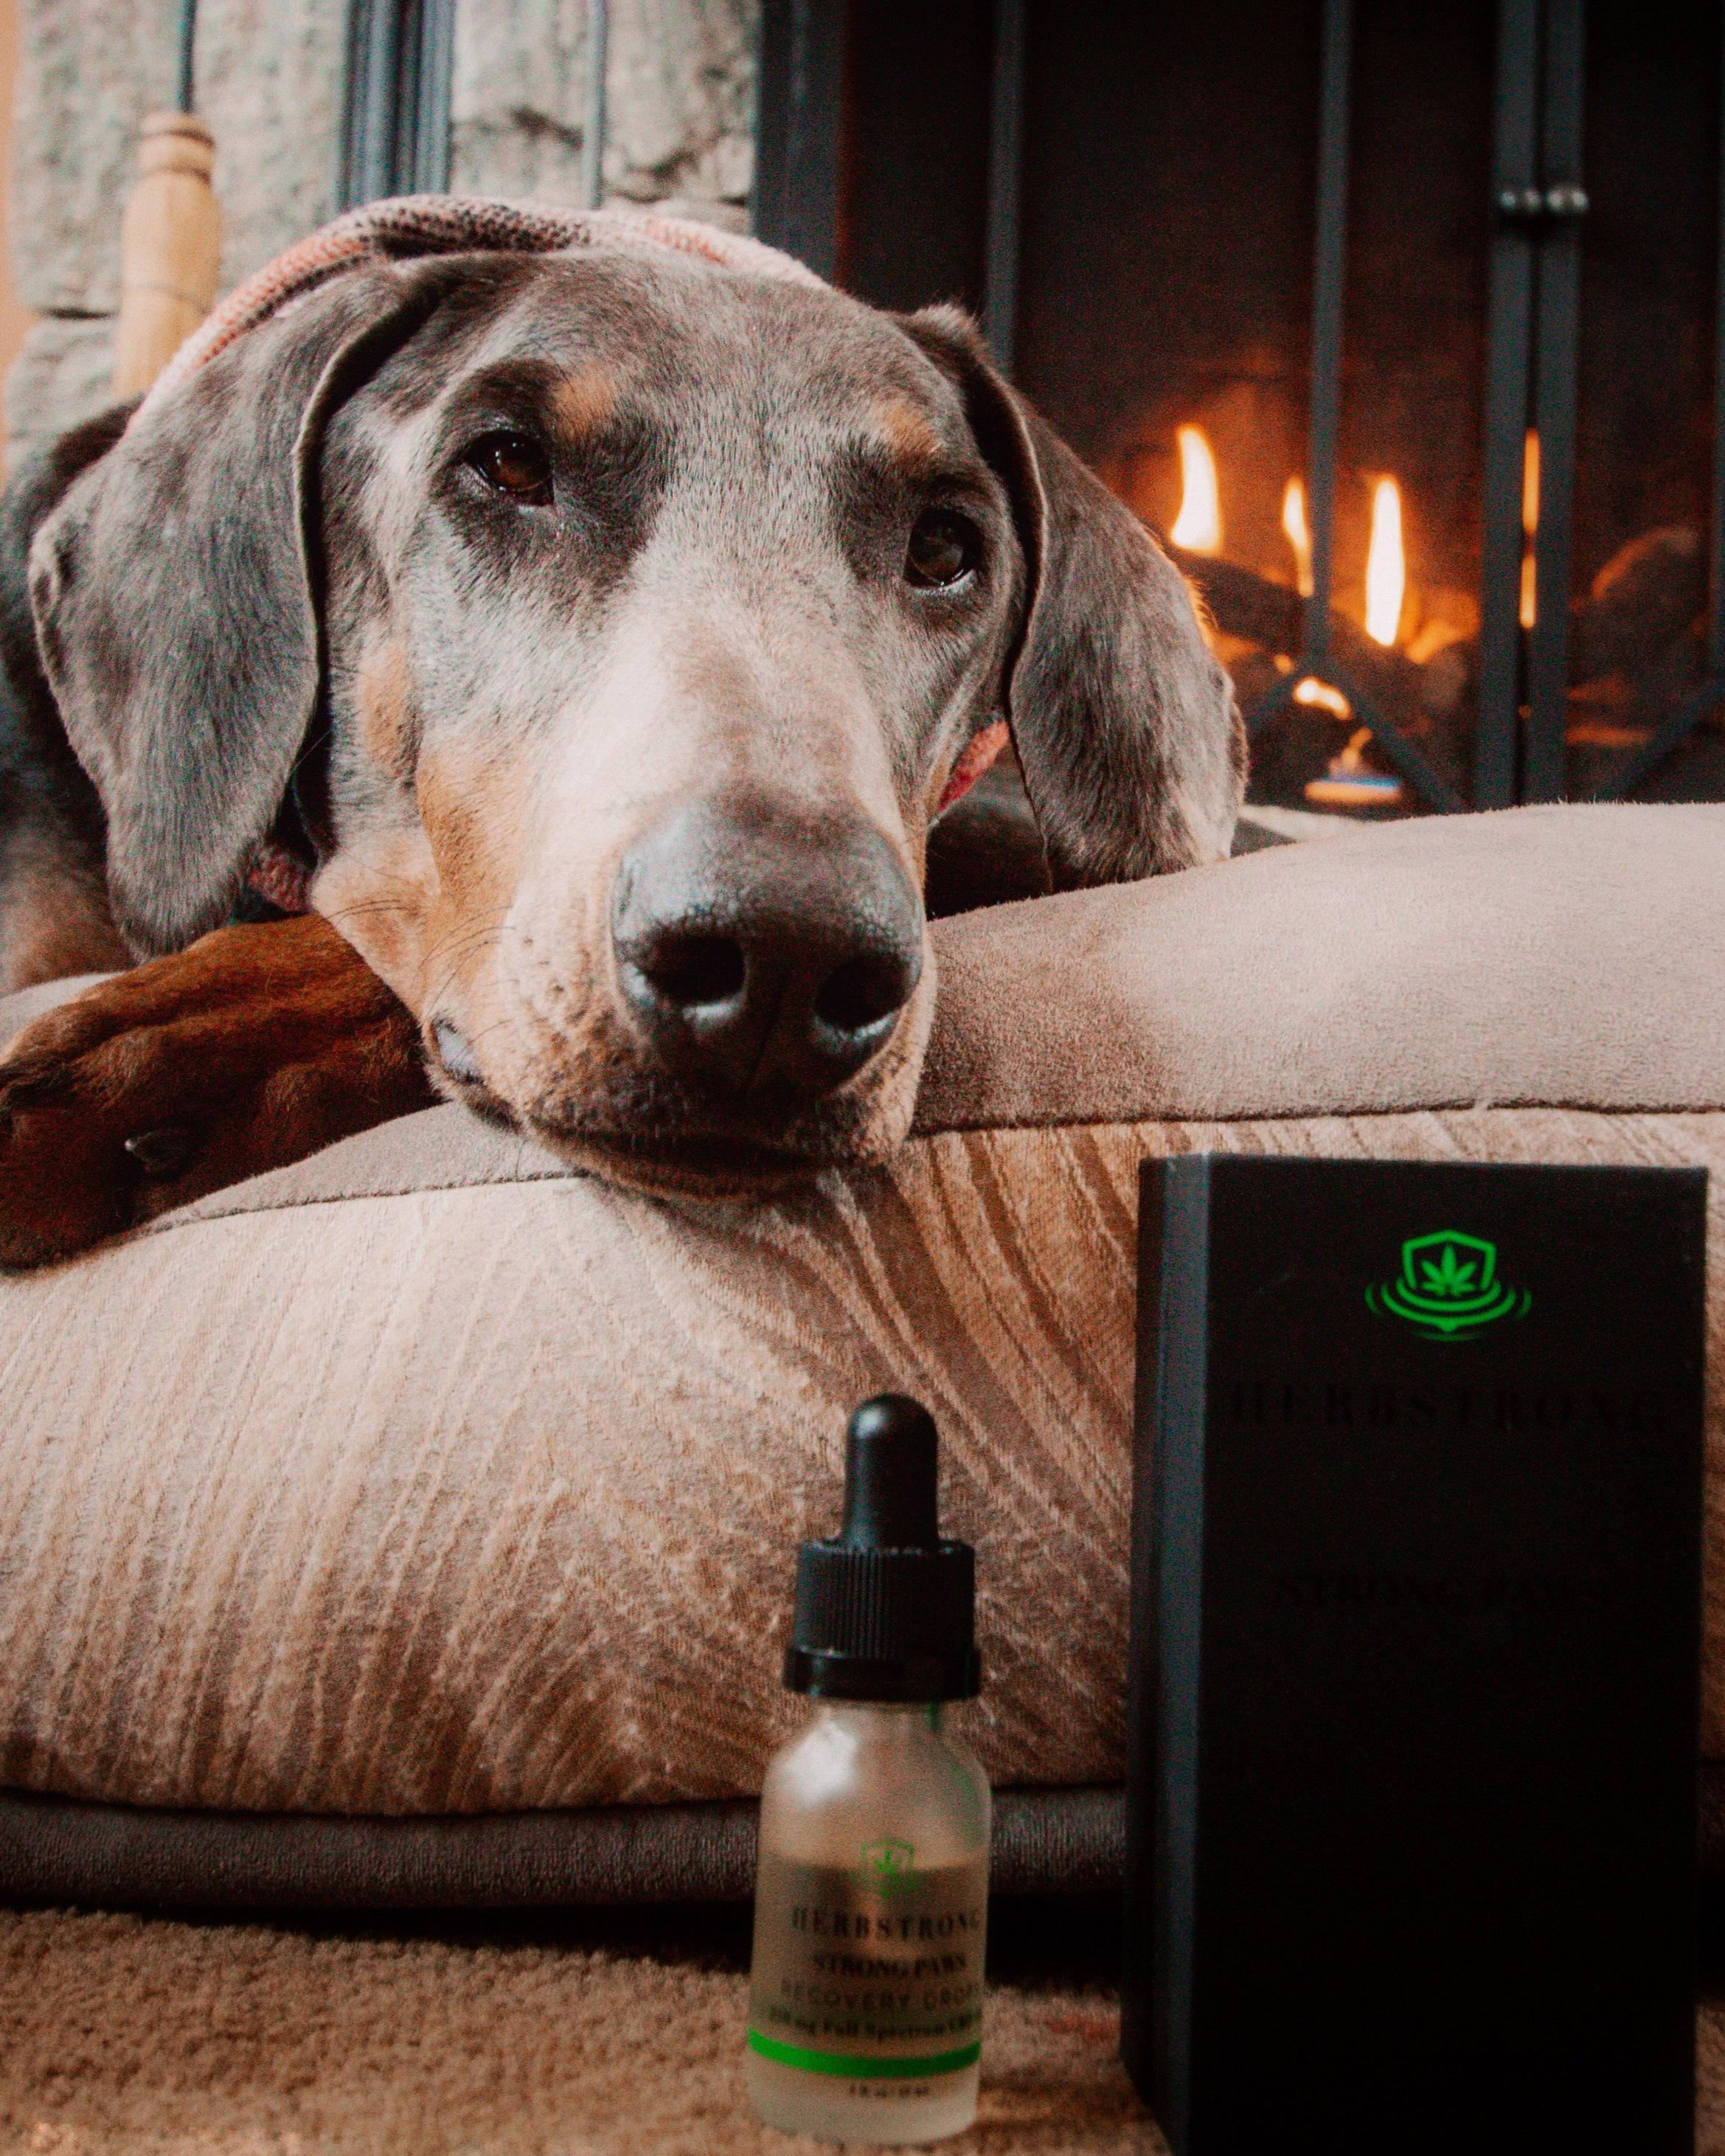 B relaxing after having a few drops of HerbStrong Paws full spectrum hemp oil.